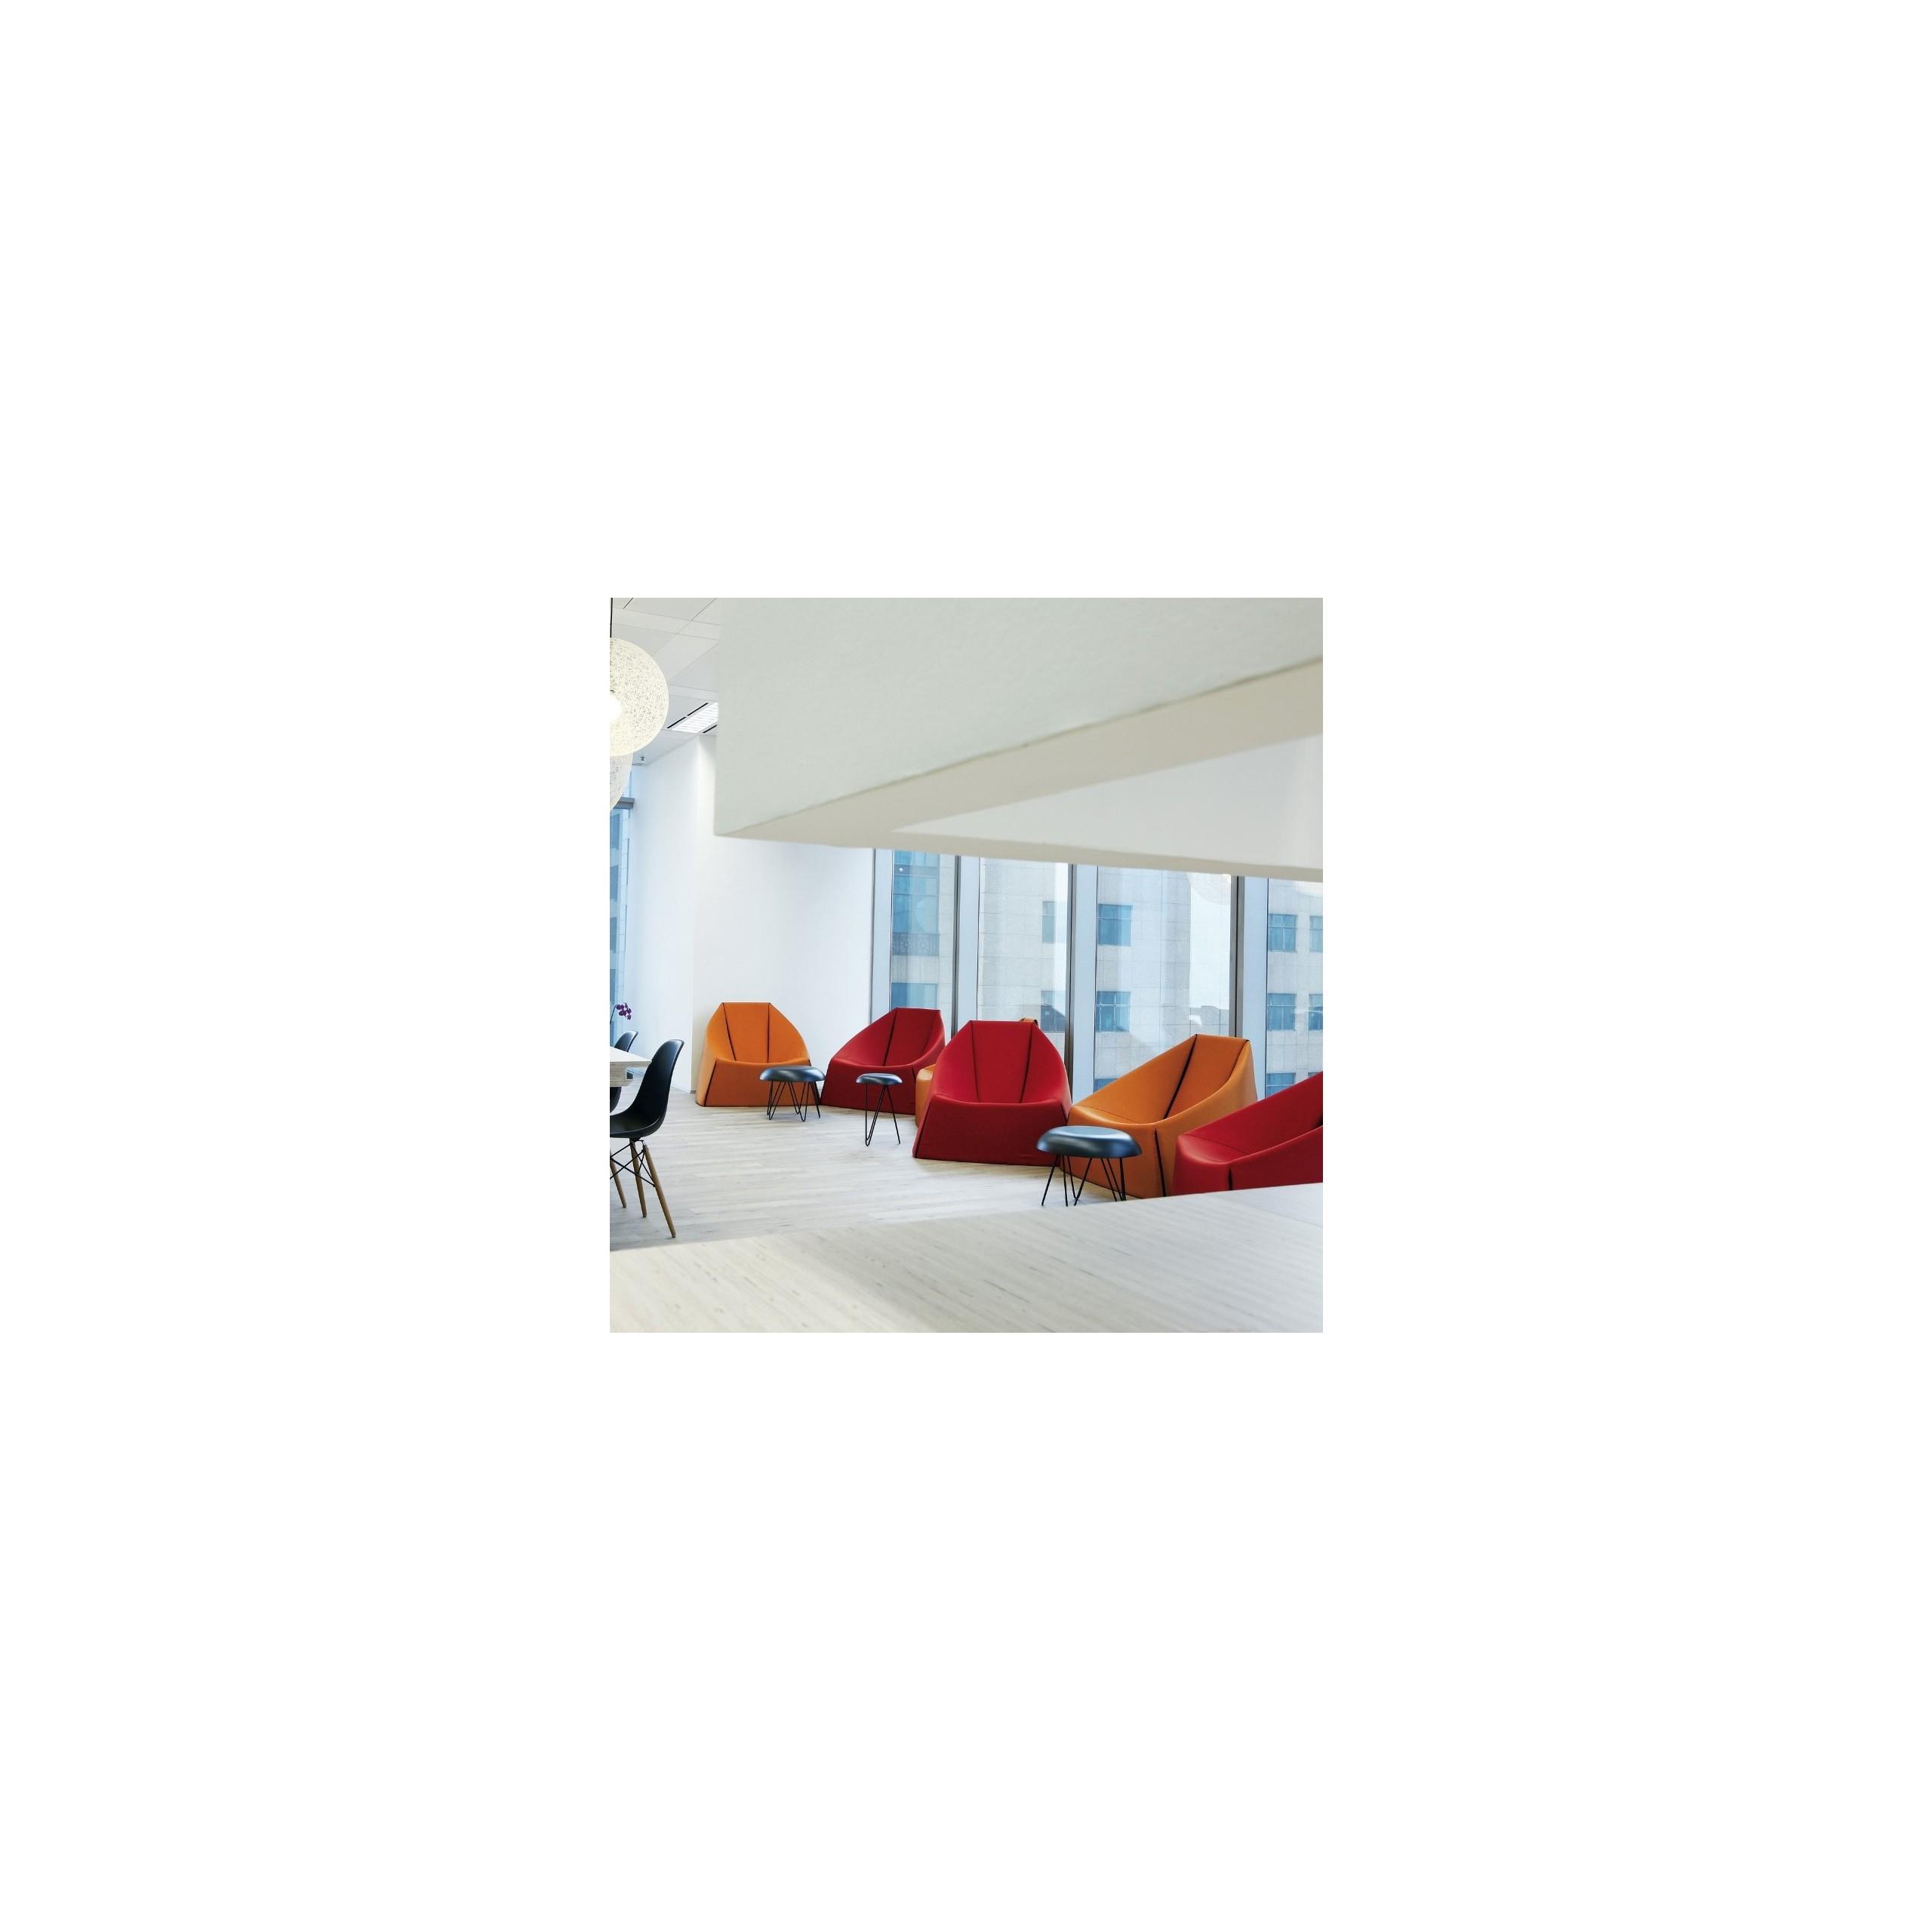 products love ubu furniture. Products Ubu Furniture. Interesting Intended Furniture Love